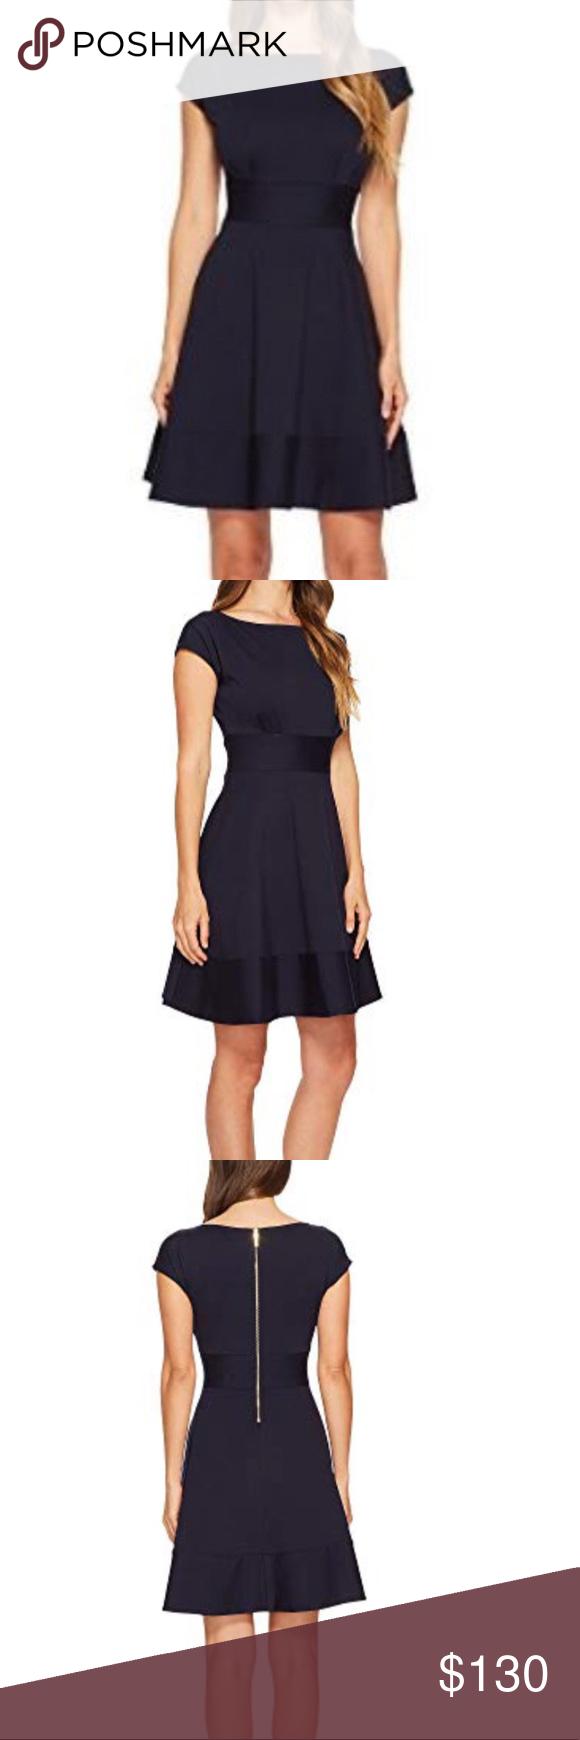 84fa9435a905 Kate Spade Broome street ponte fiorella dress Exude a level of untold  elegance when you wear